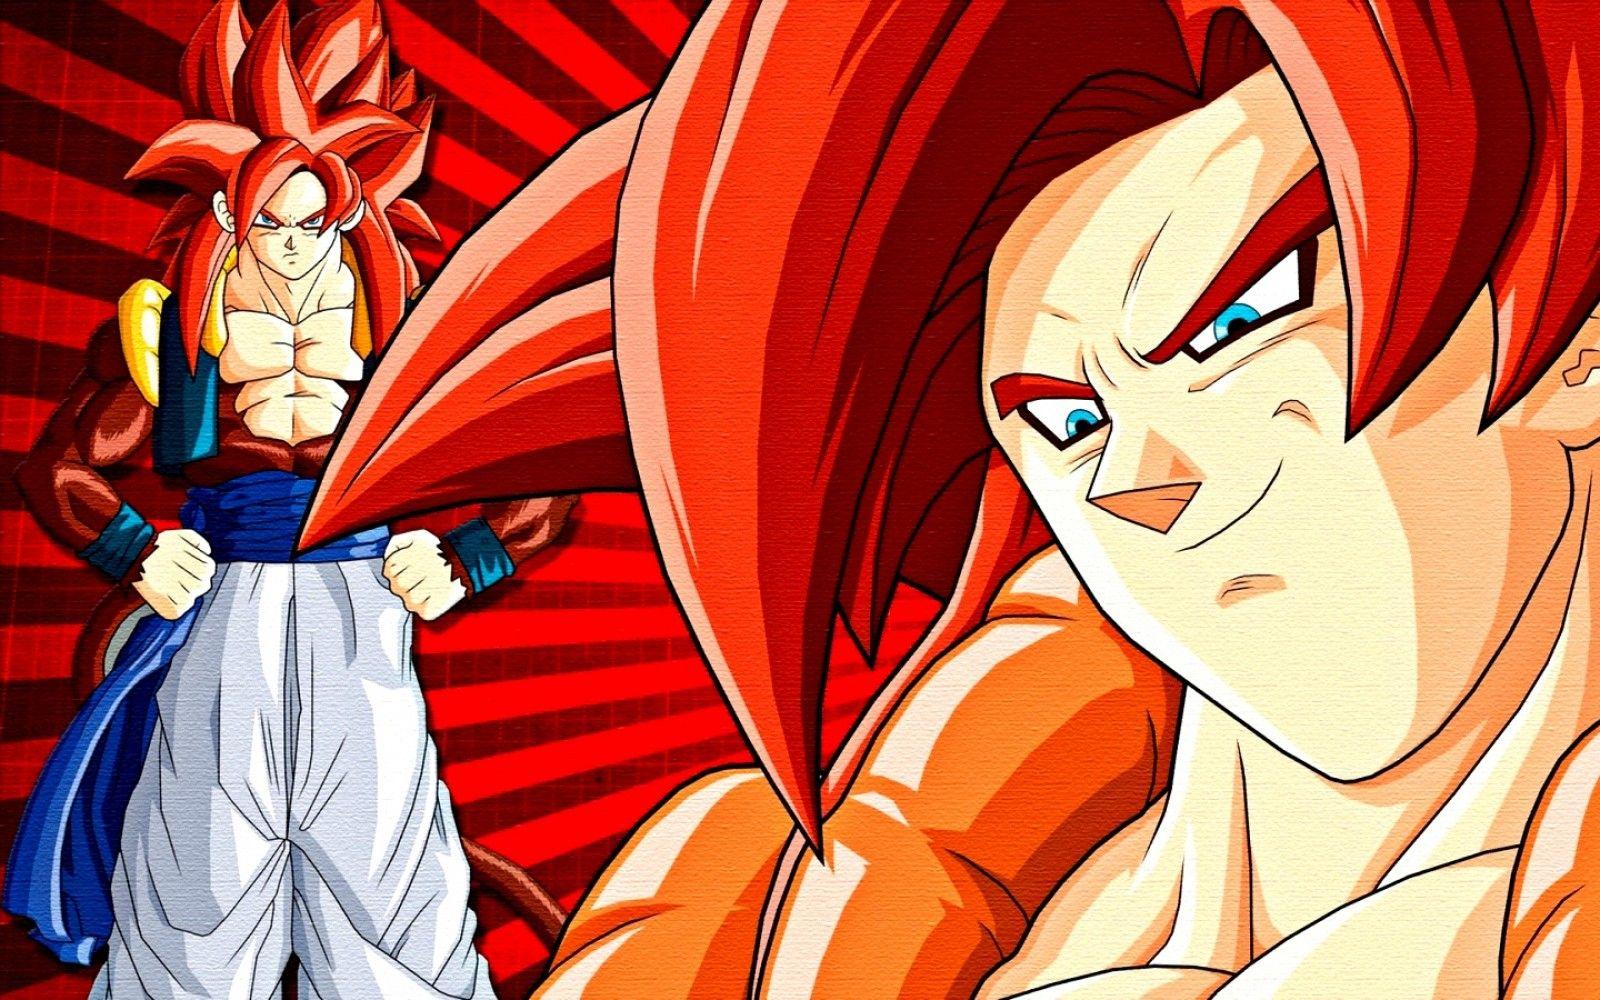 Dragon Ball Z Super Gogeta Fusion SSJ 4 Wallpaper | The ...